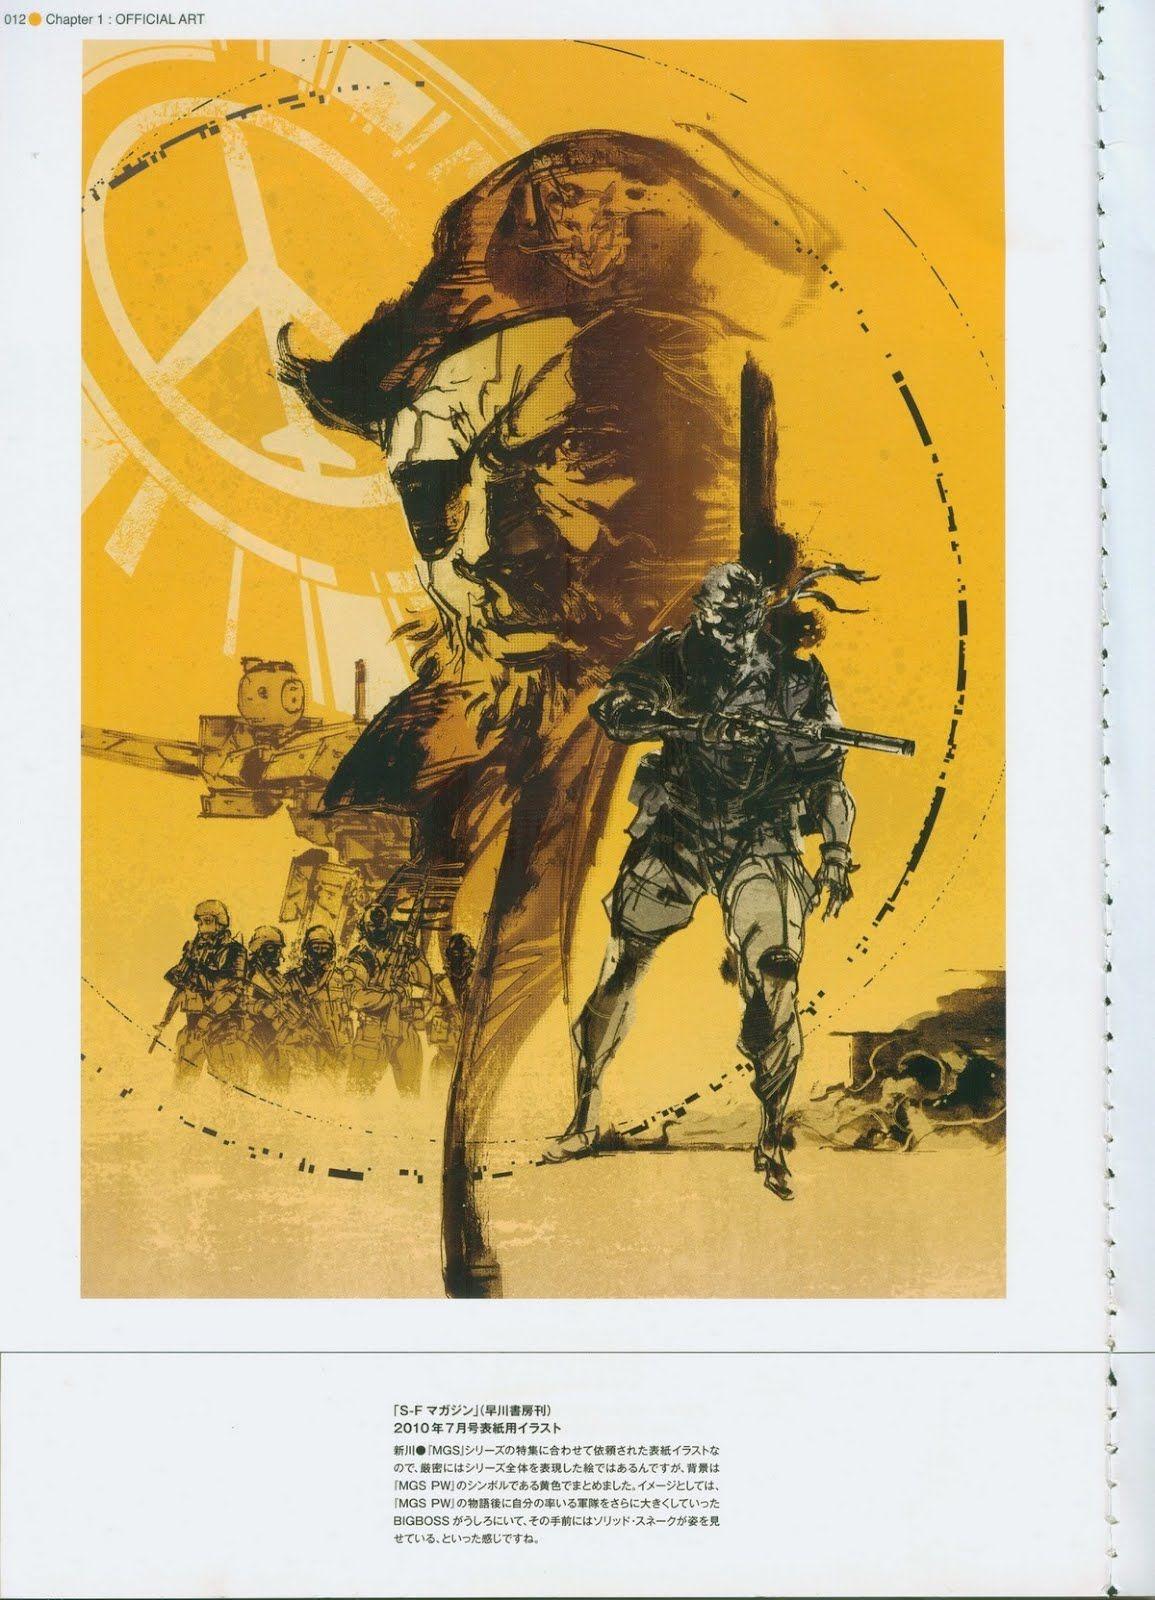 Yoji Shinkawa - The Art of Metal Gear Solid: Peace Walker | Metal ...